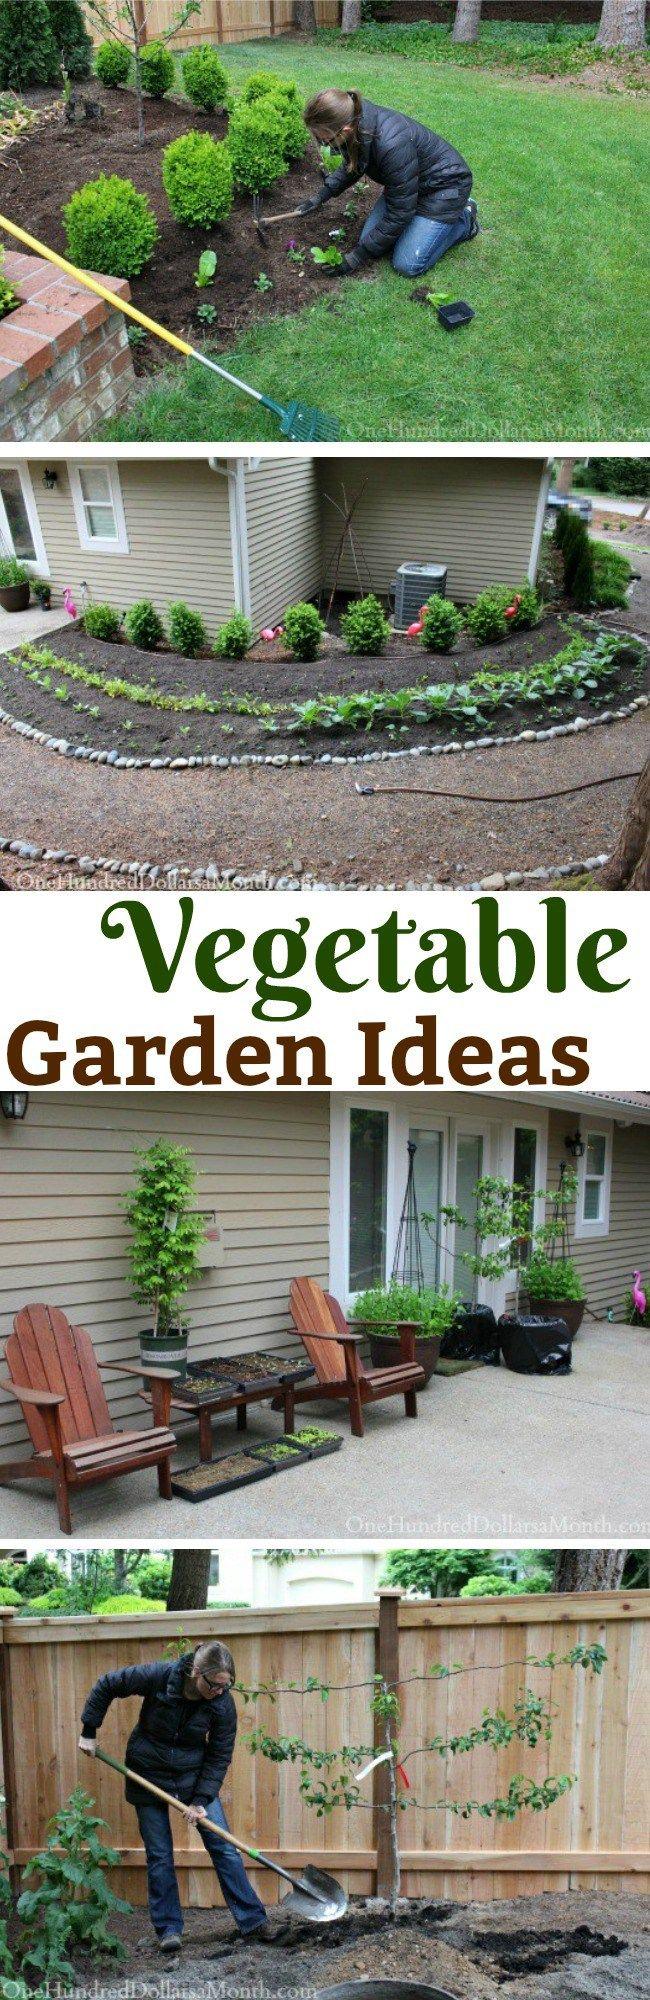 vegetable gardens ideas